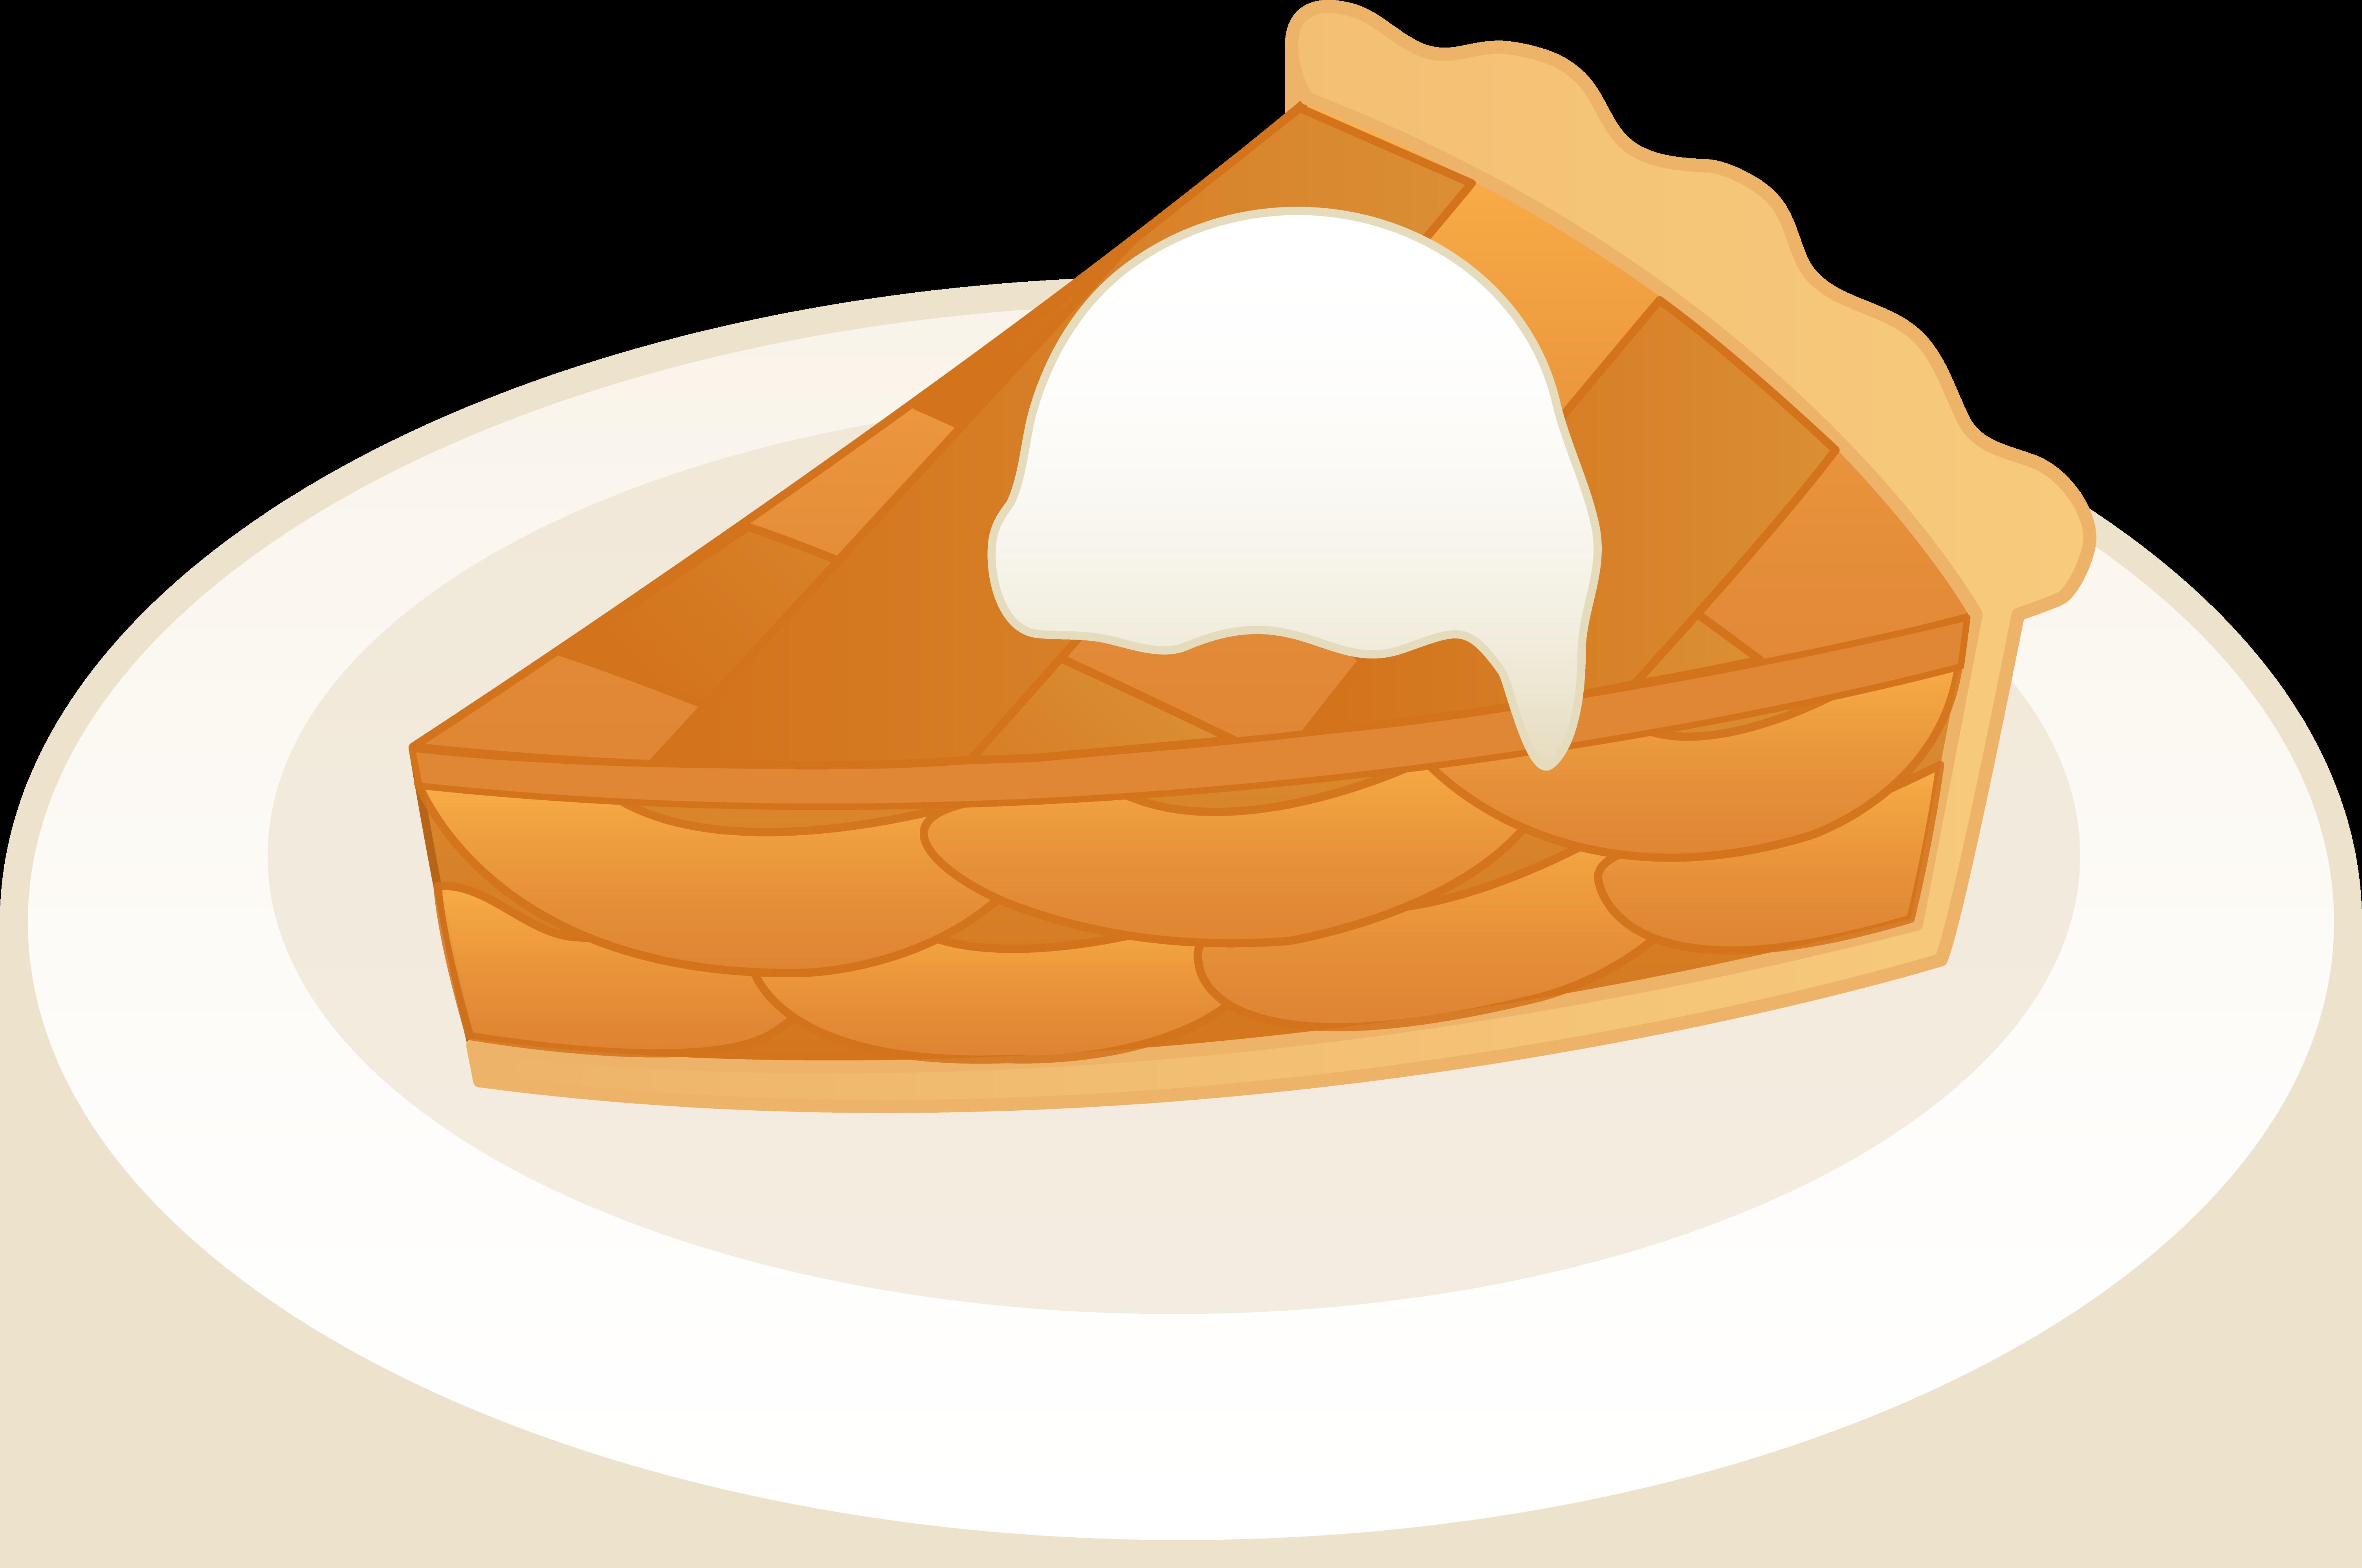 Pies clipart peach pie La Ice Pie Free Mode